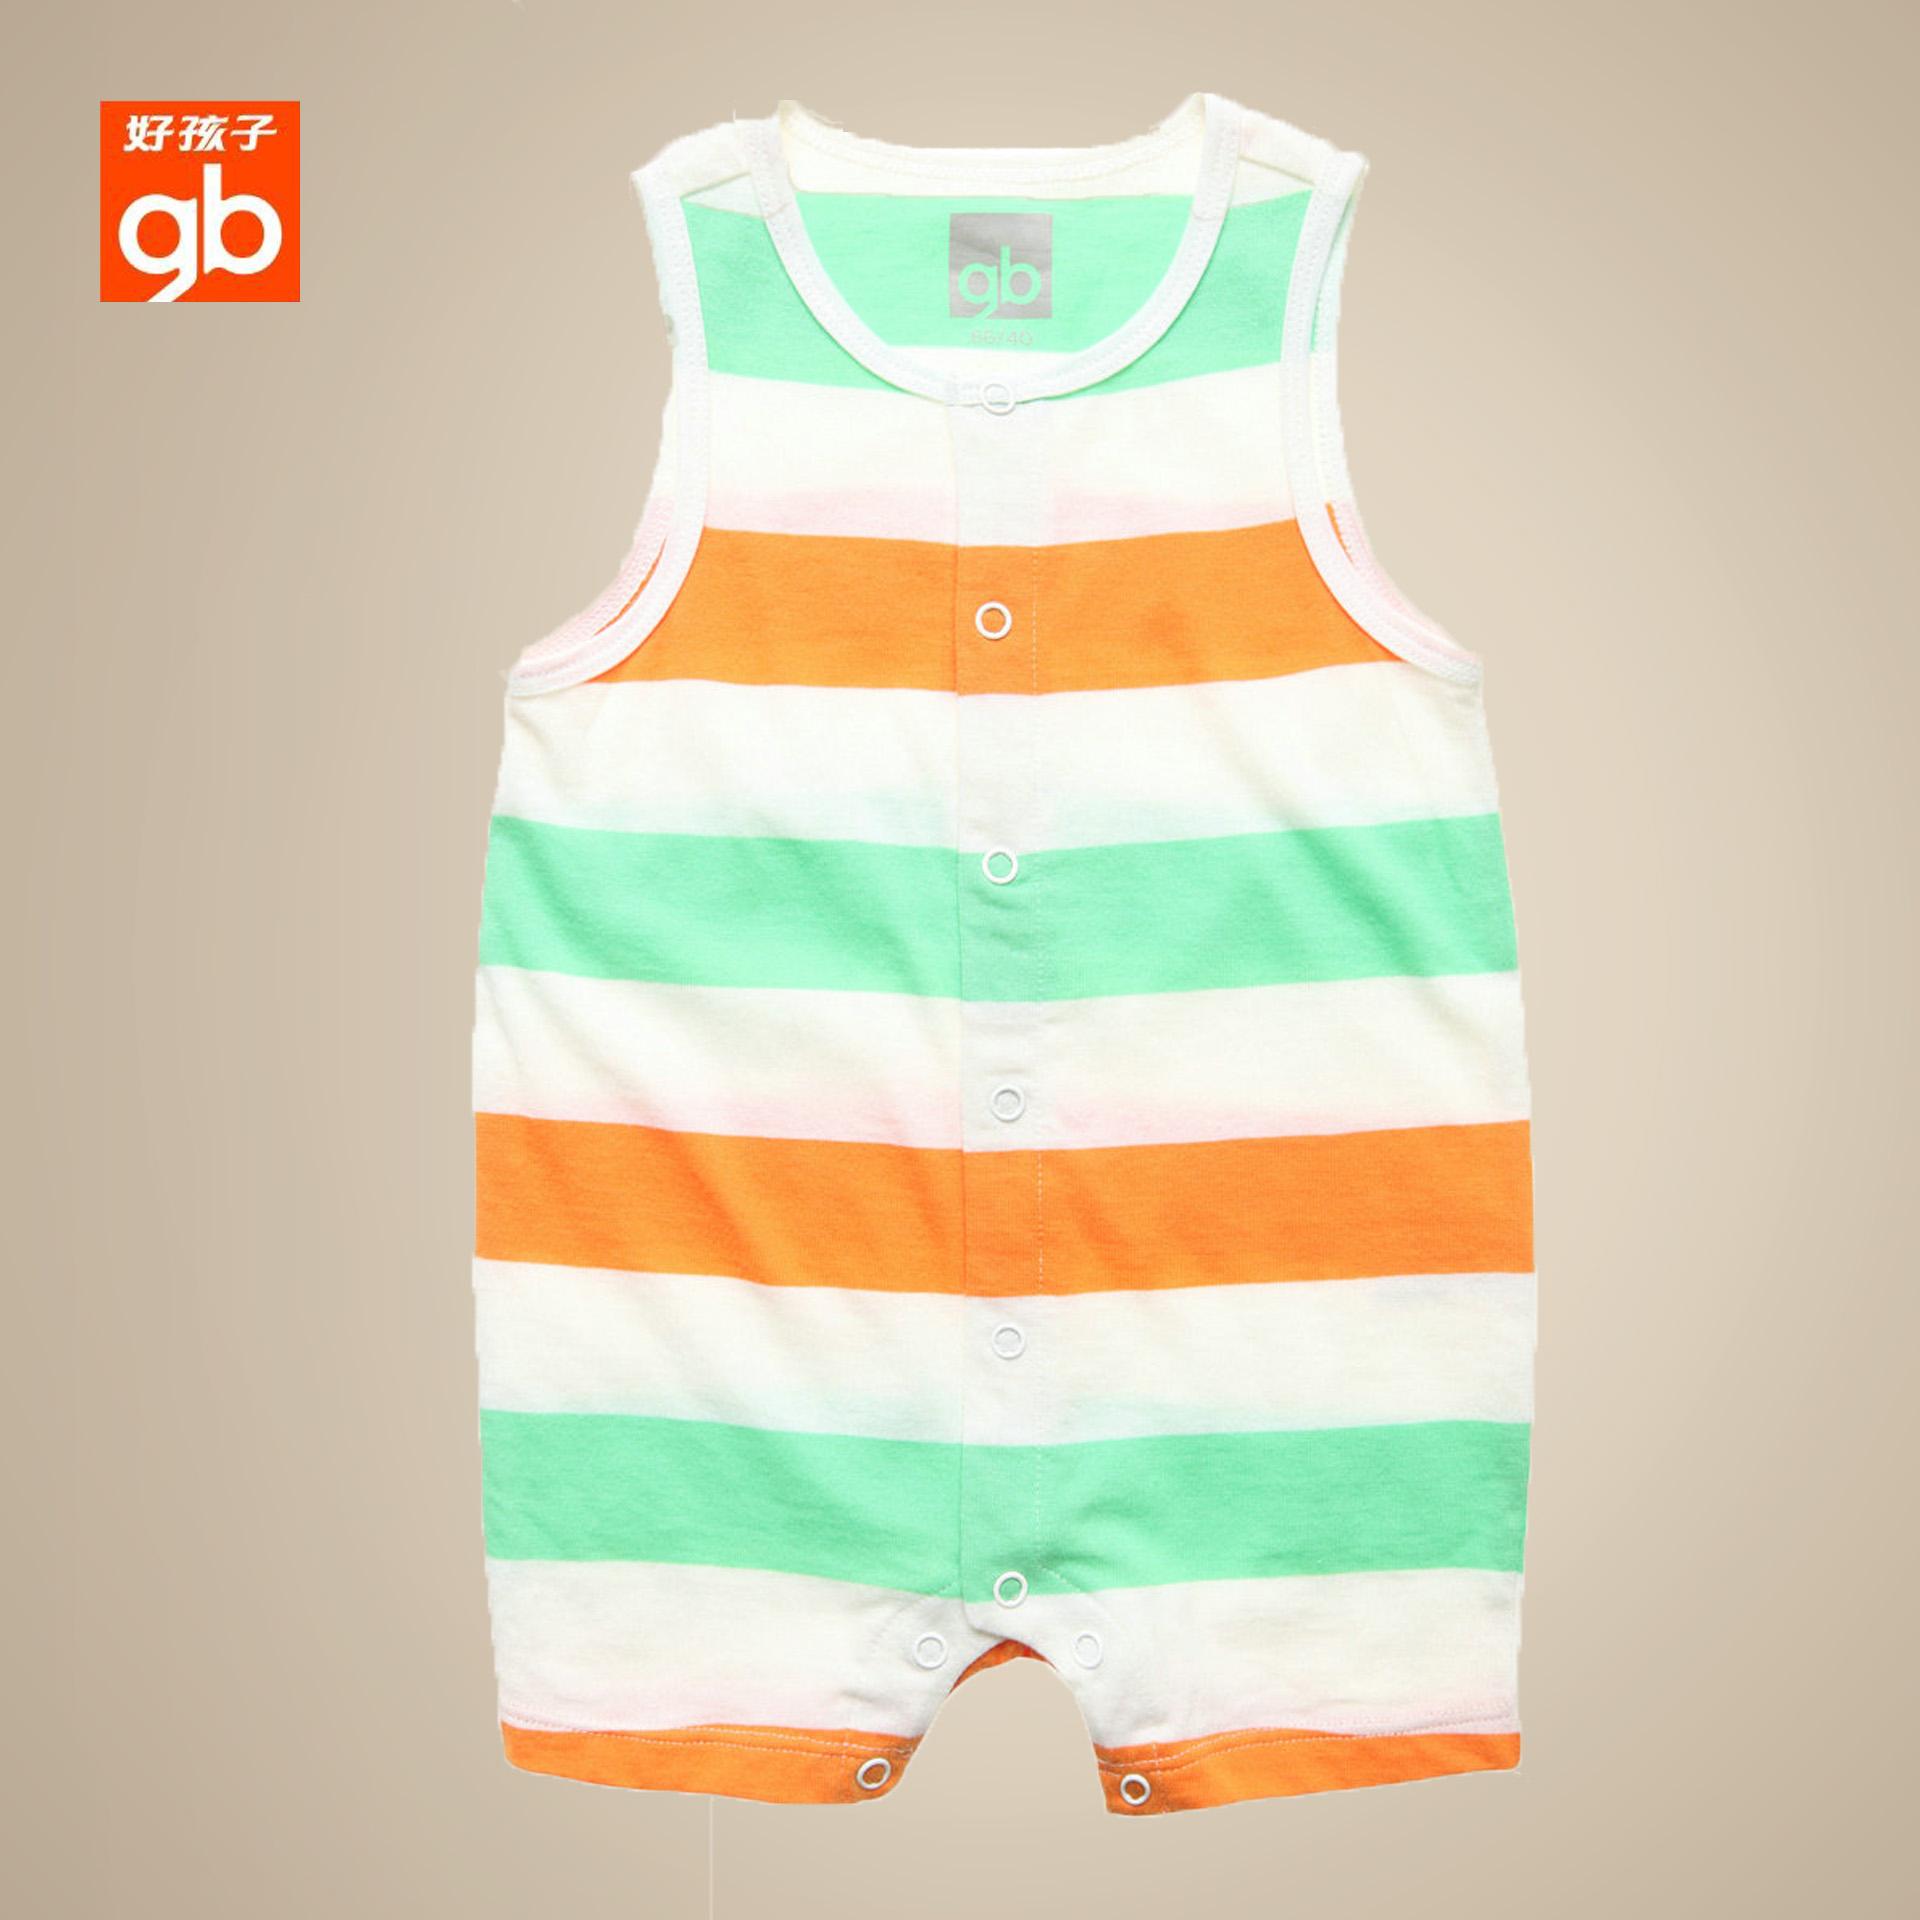 839357e5570a China Infant Boy Clothes